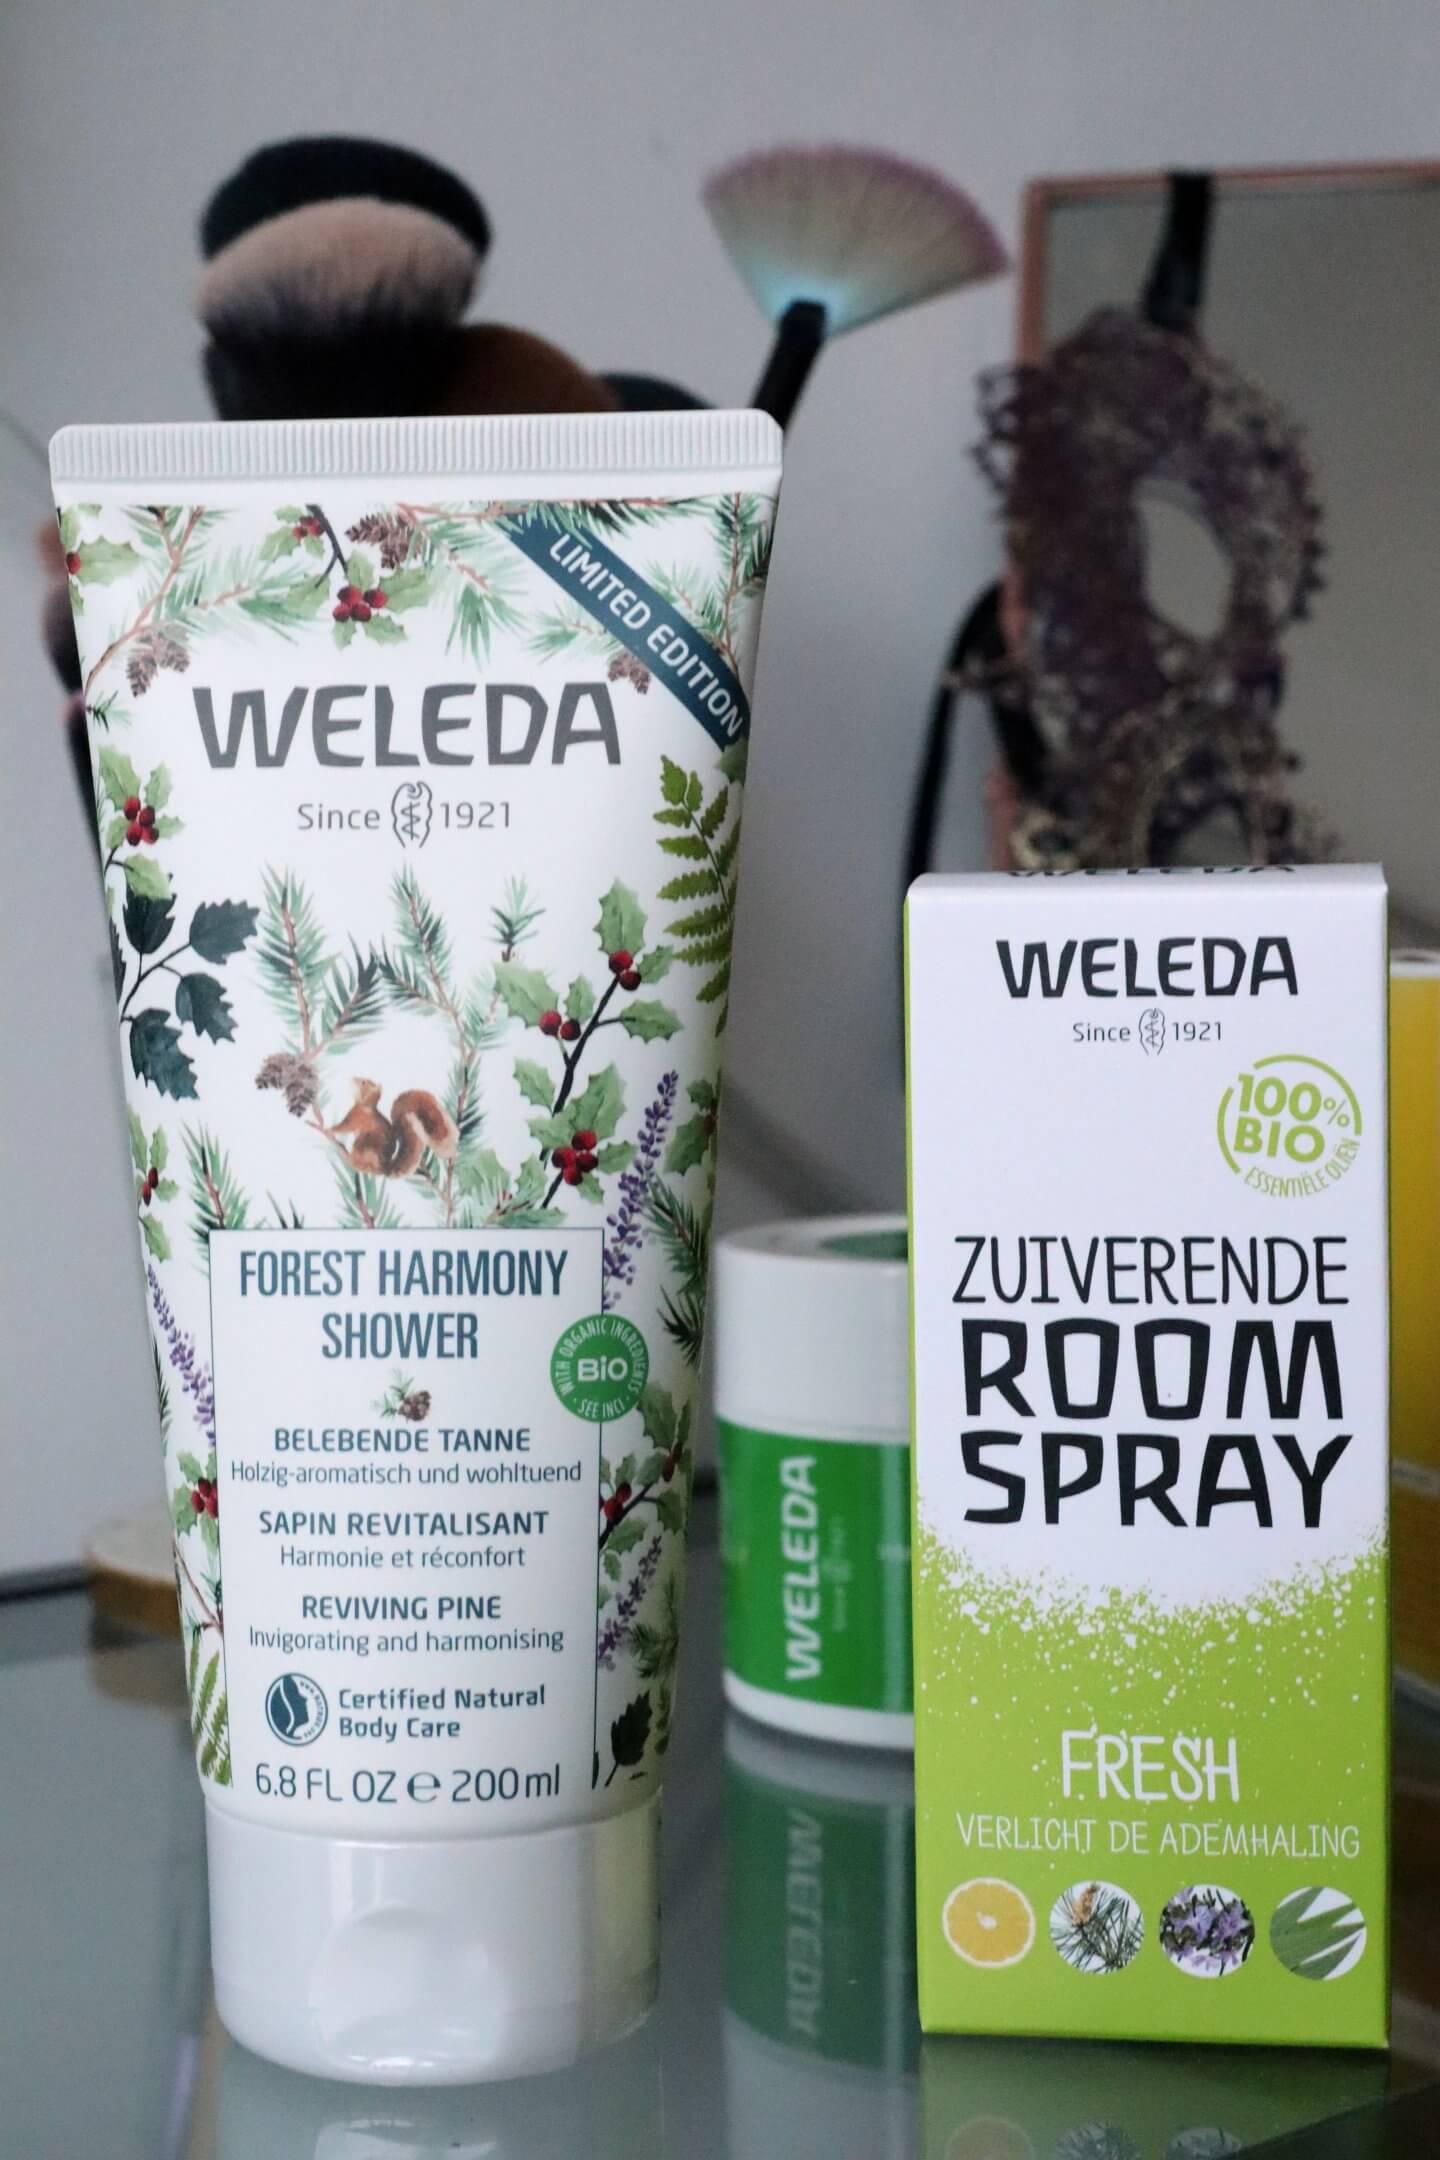 Weleda winter favourites of 2019. Room spray and weleda shower gel.